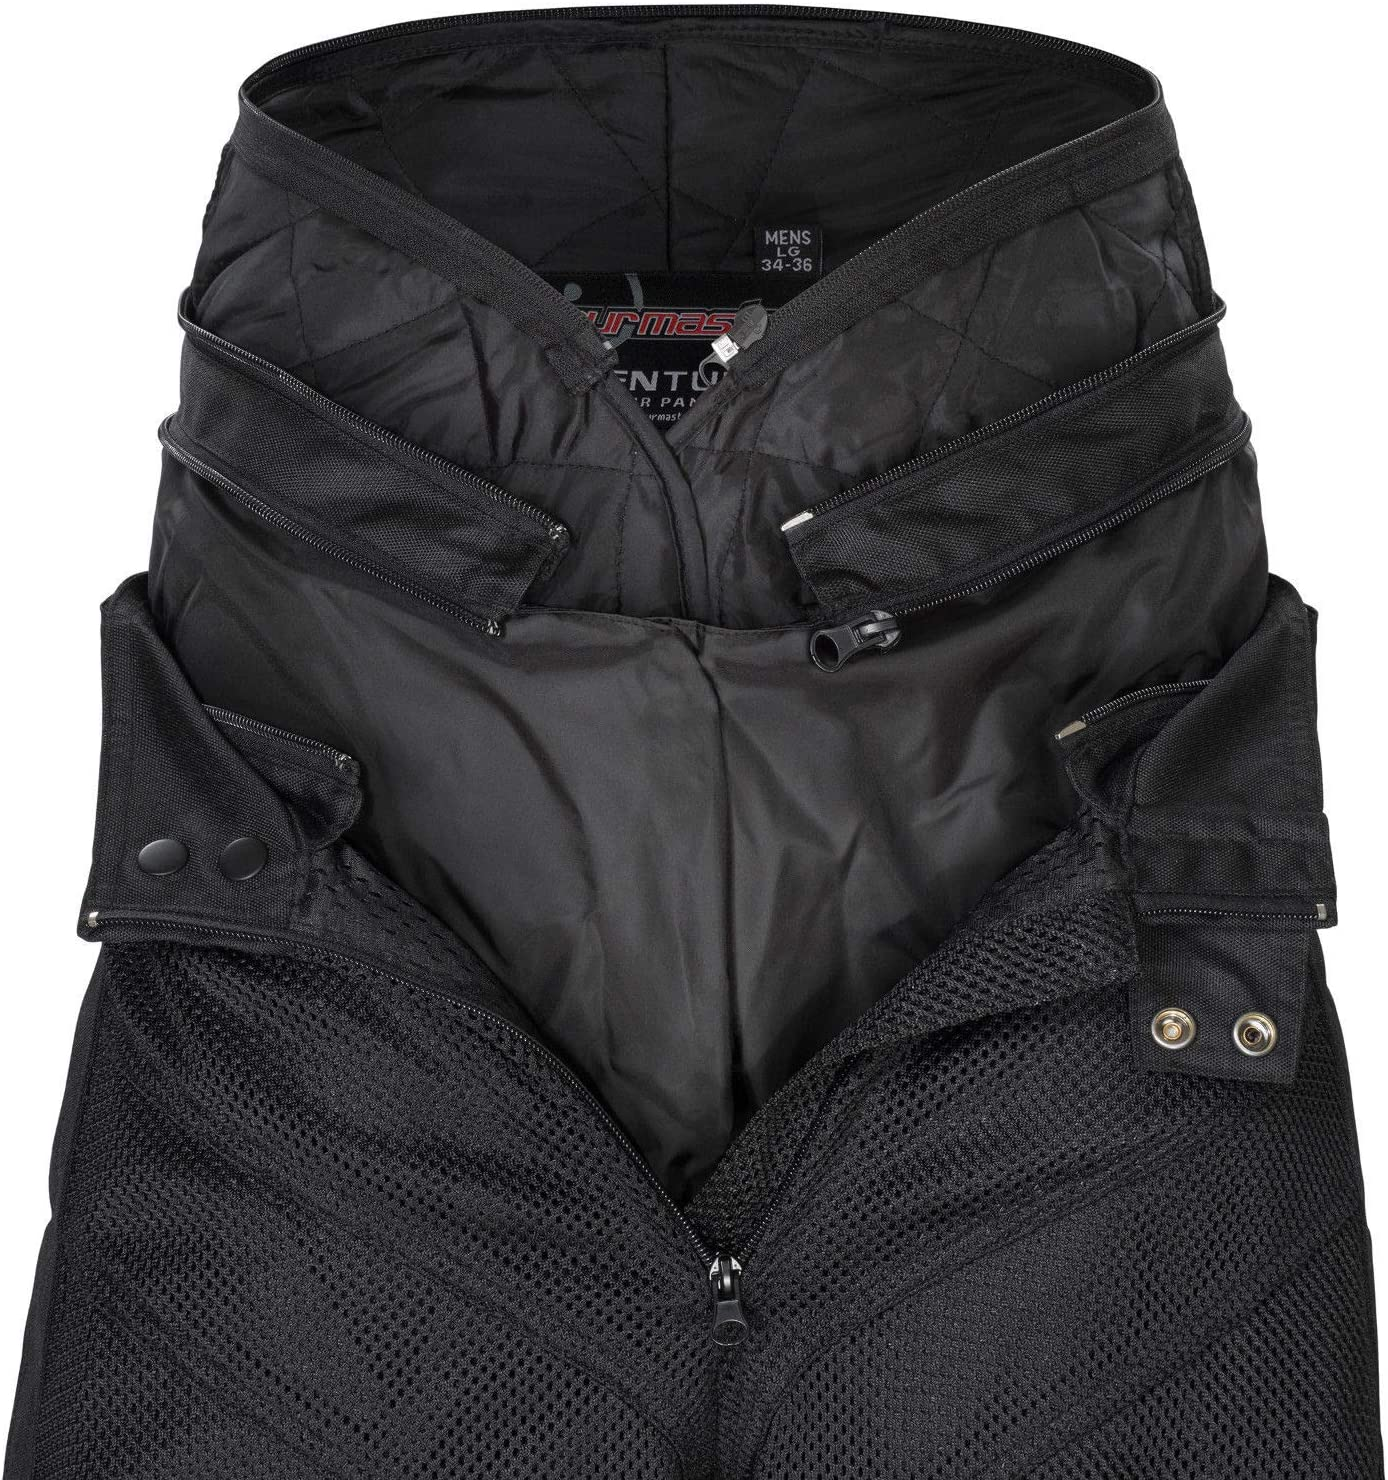 Black, Short XX-Large Tourmaster Venture Air 2.0 Mens Textile Motorcycle Pant